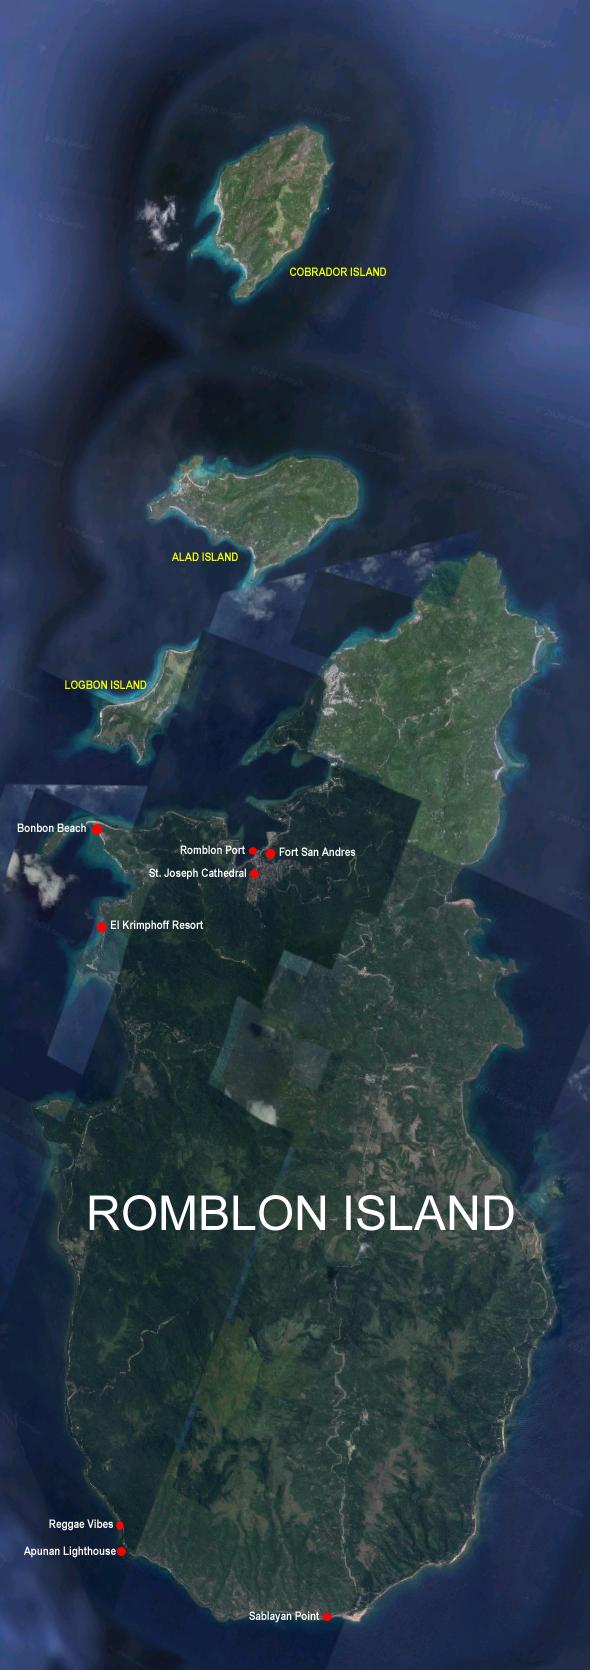 romblon island spot map of tourist destinations kapampangan traveller